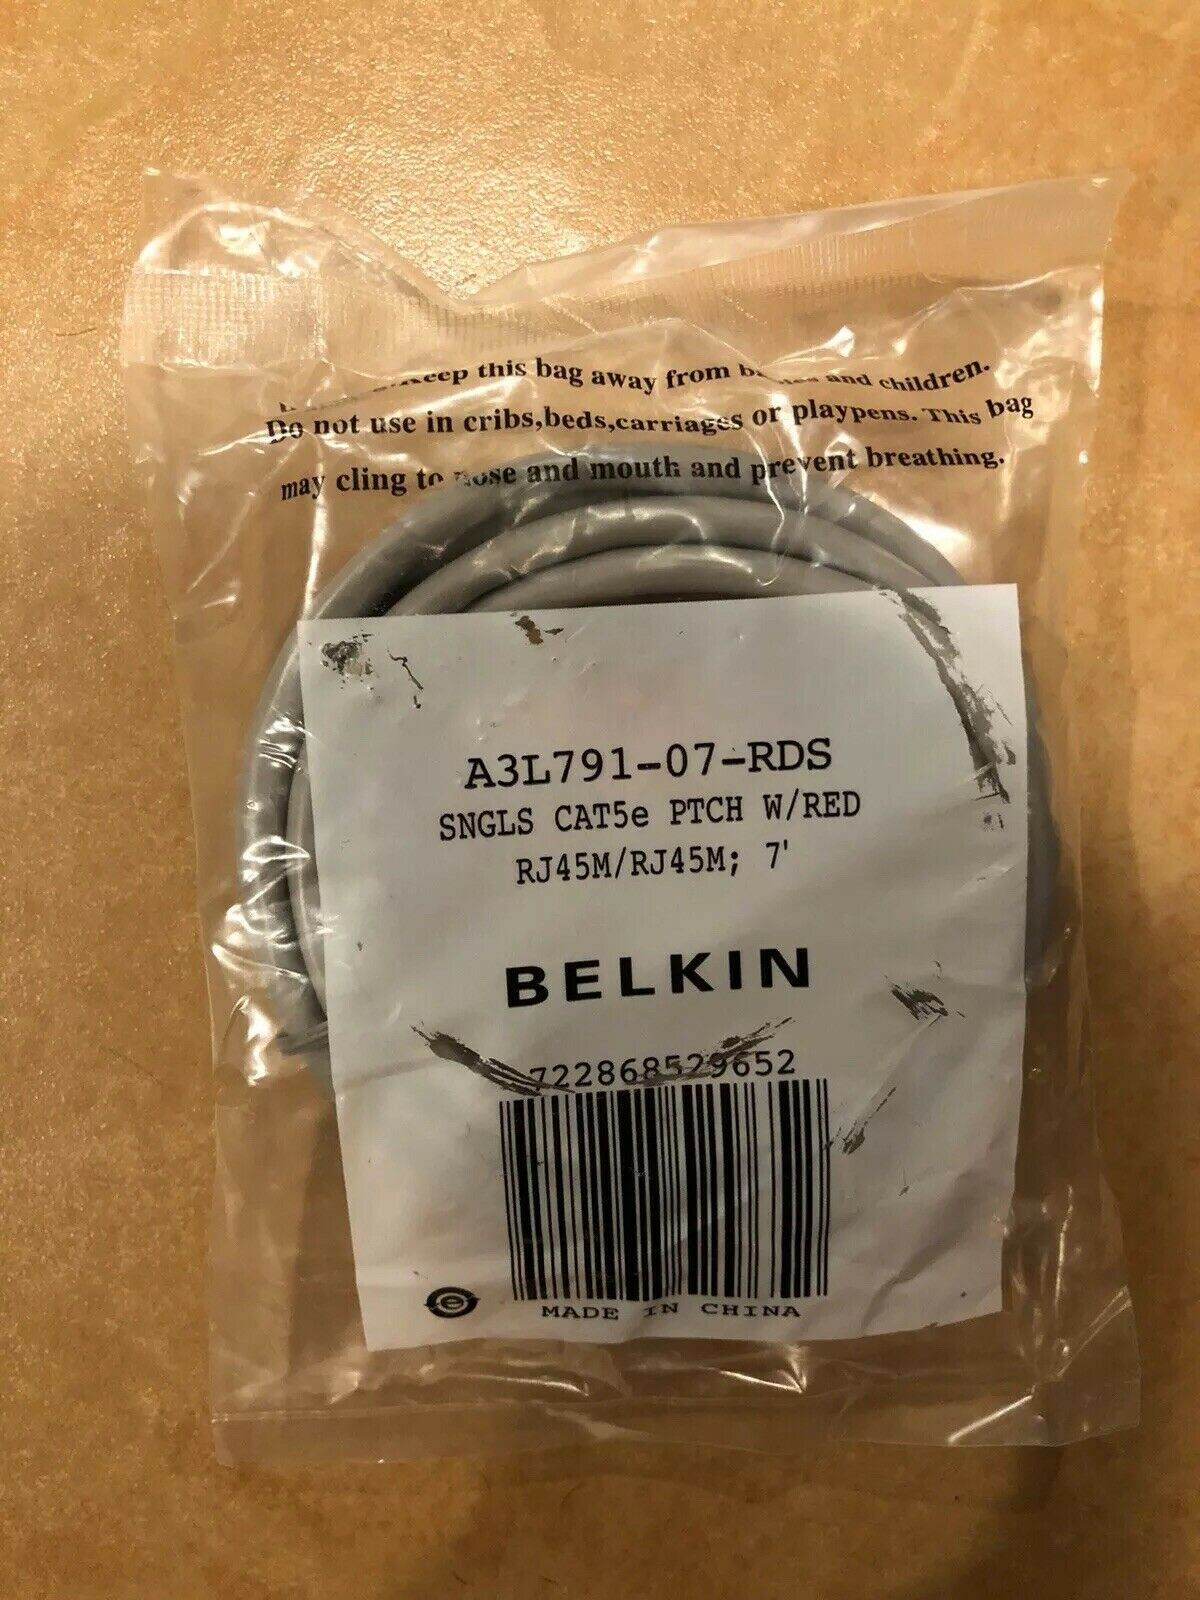 A3L791-07-BLU-M Belkin 7FT Cable Patch CAT5 UTP-4PR RJ45M BLU Molded